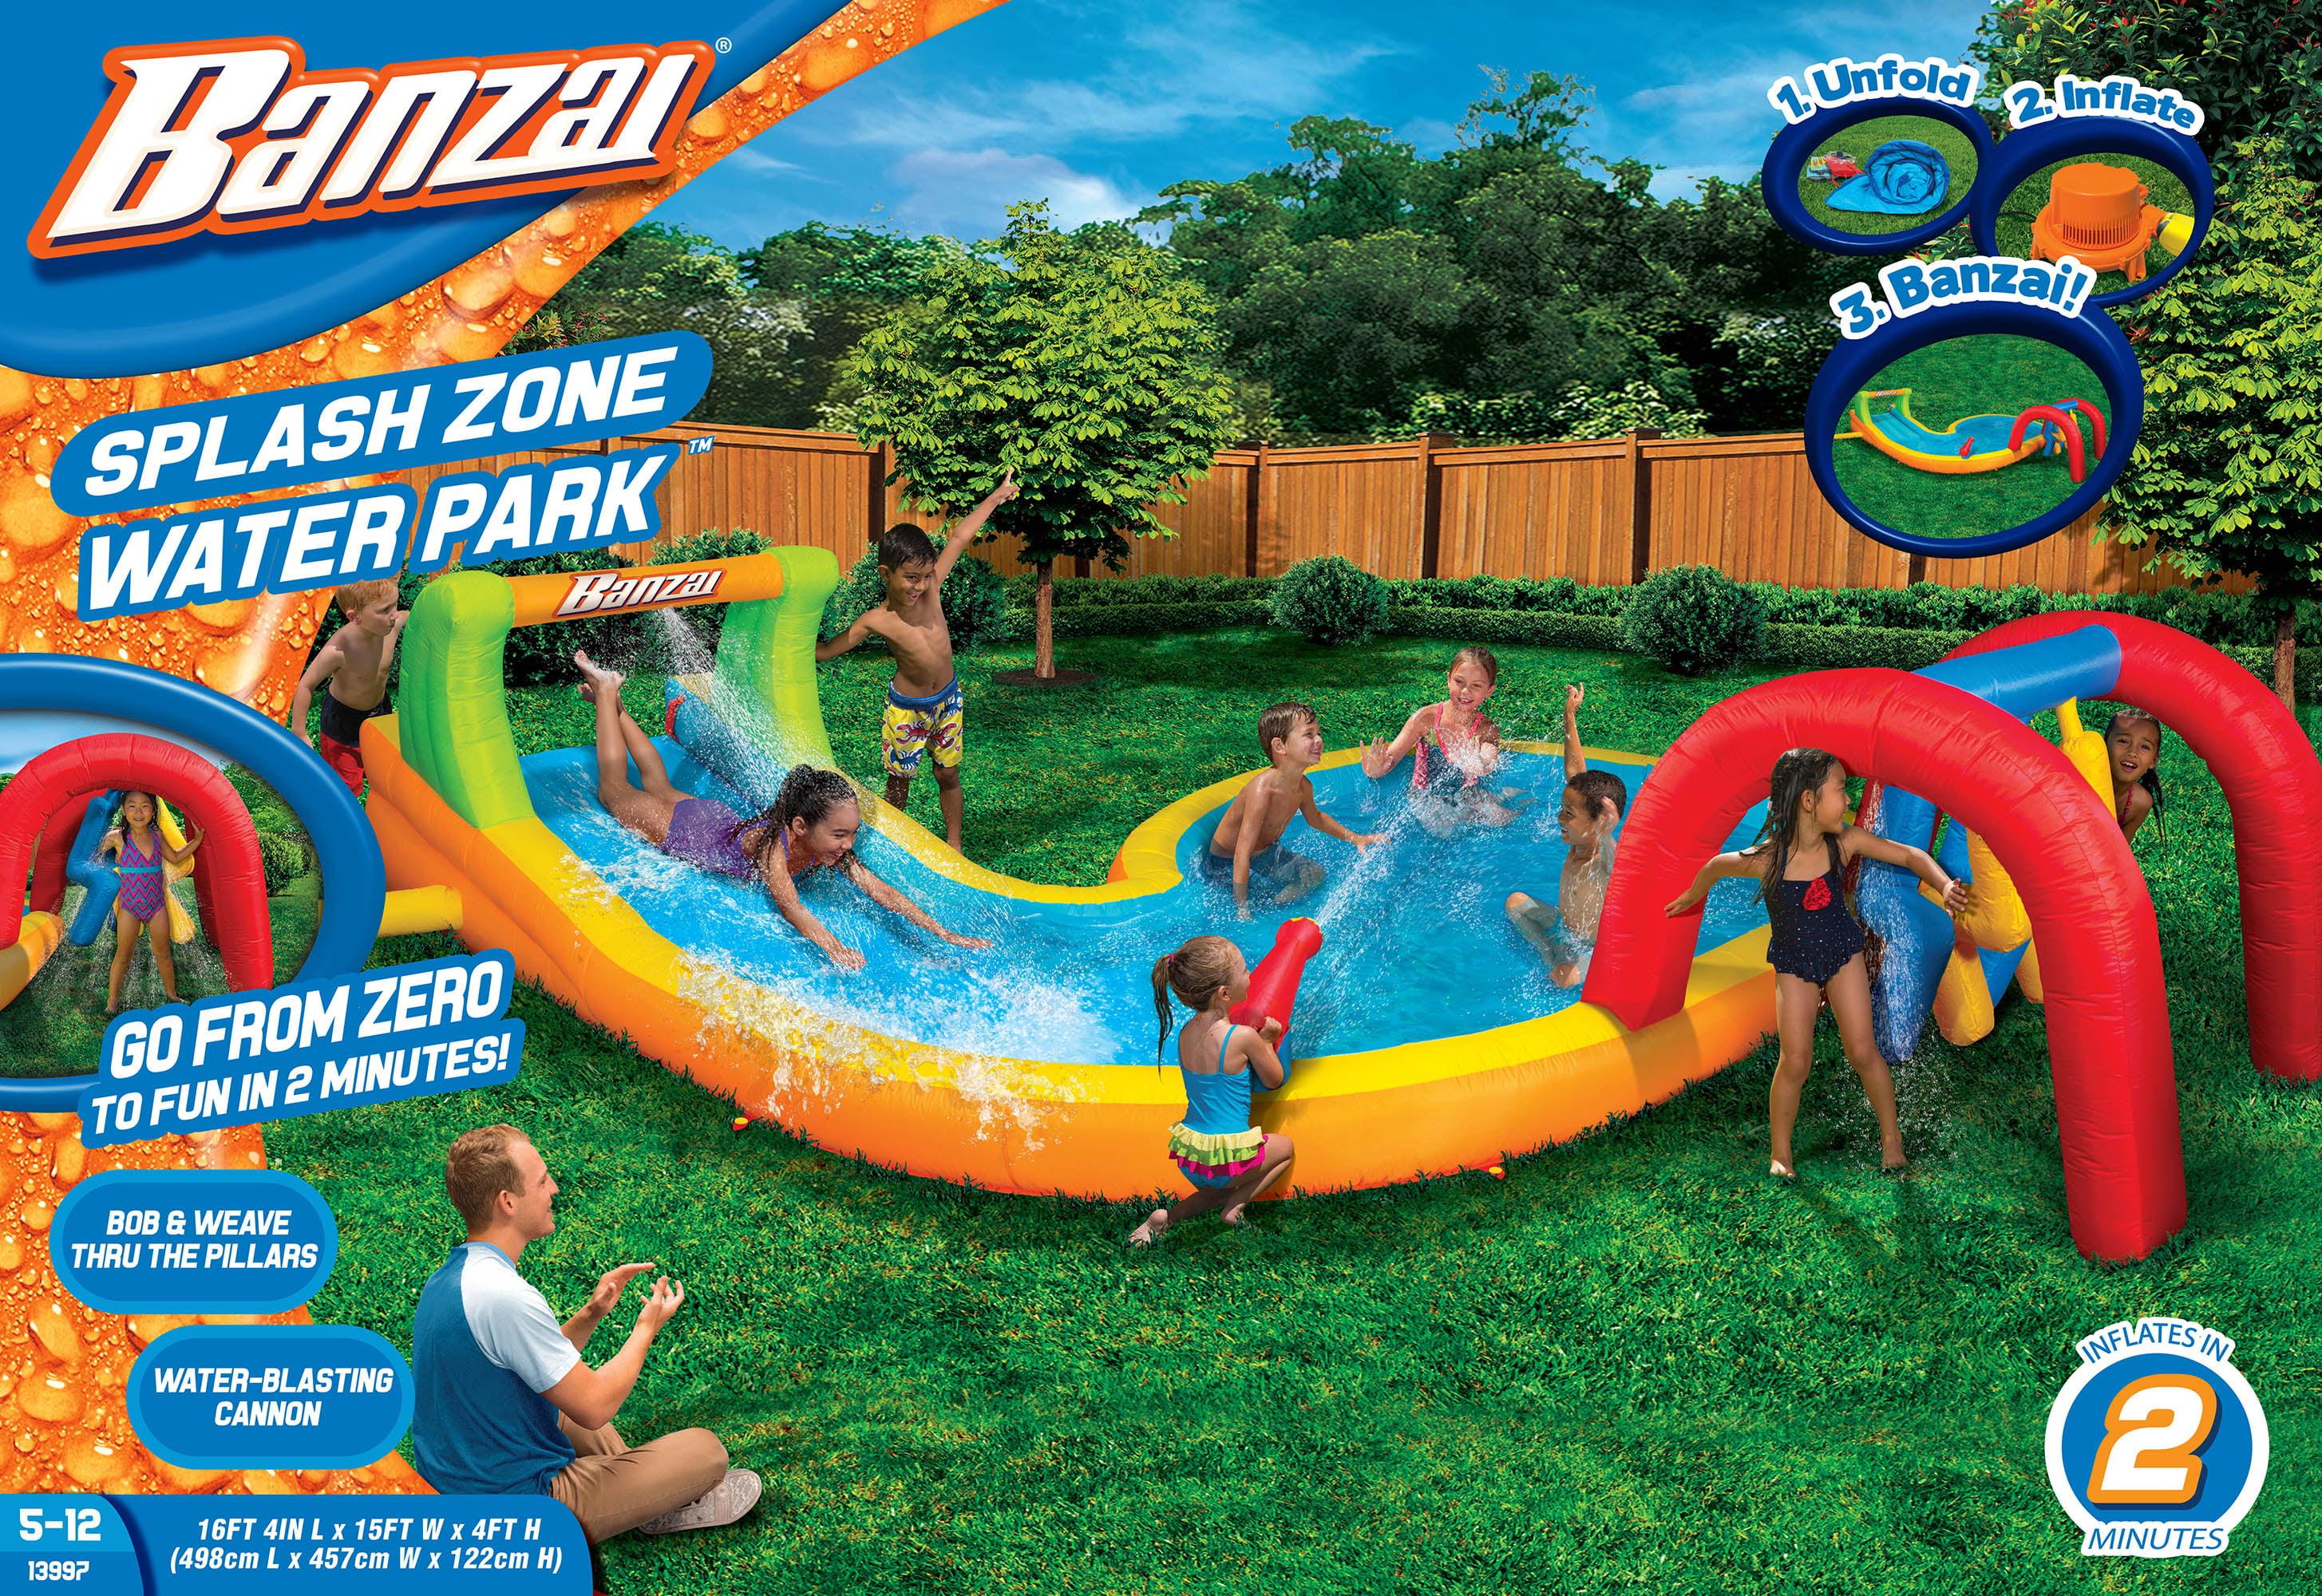 Banzai Water Park Splash Zone (Inflatable Waterslide Summer Backyard Splash Pool Aqua Gun Blaster Cannons) by Banzai